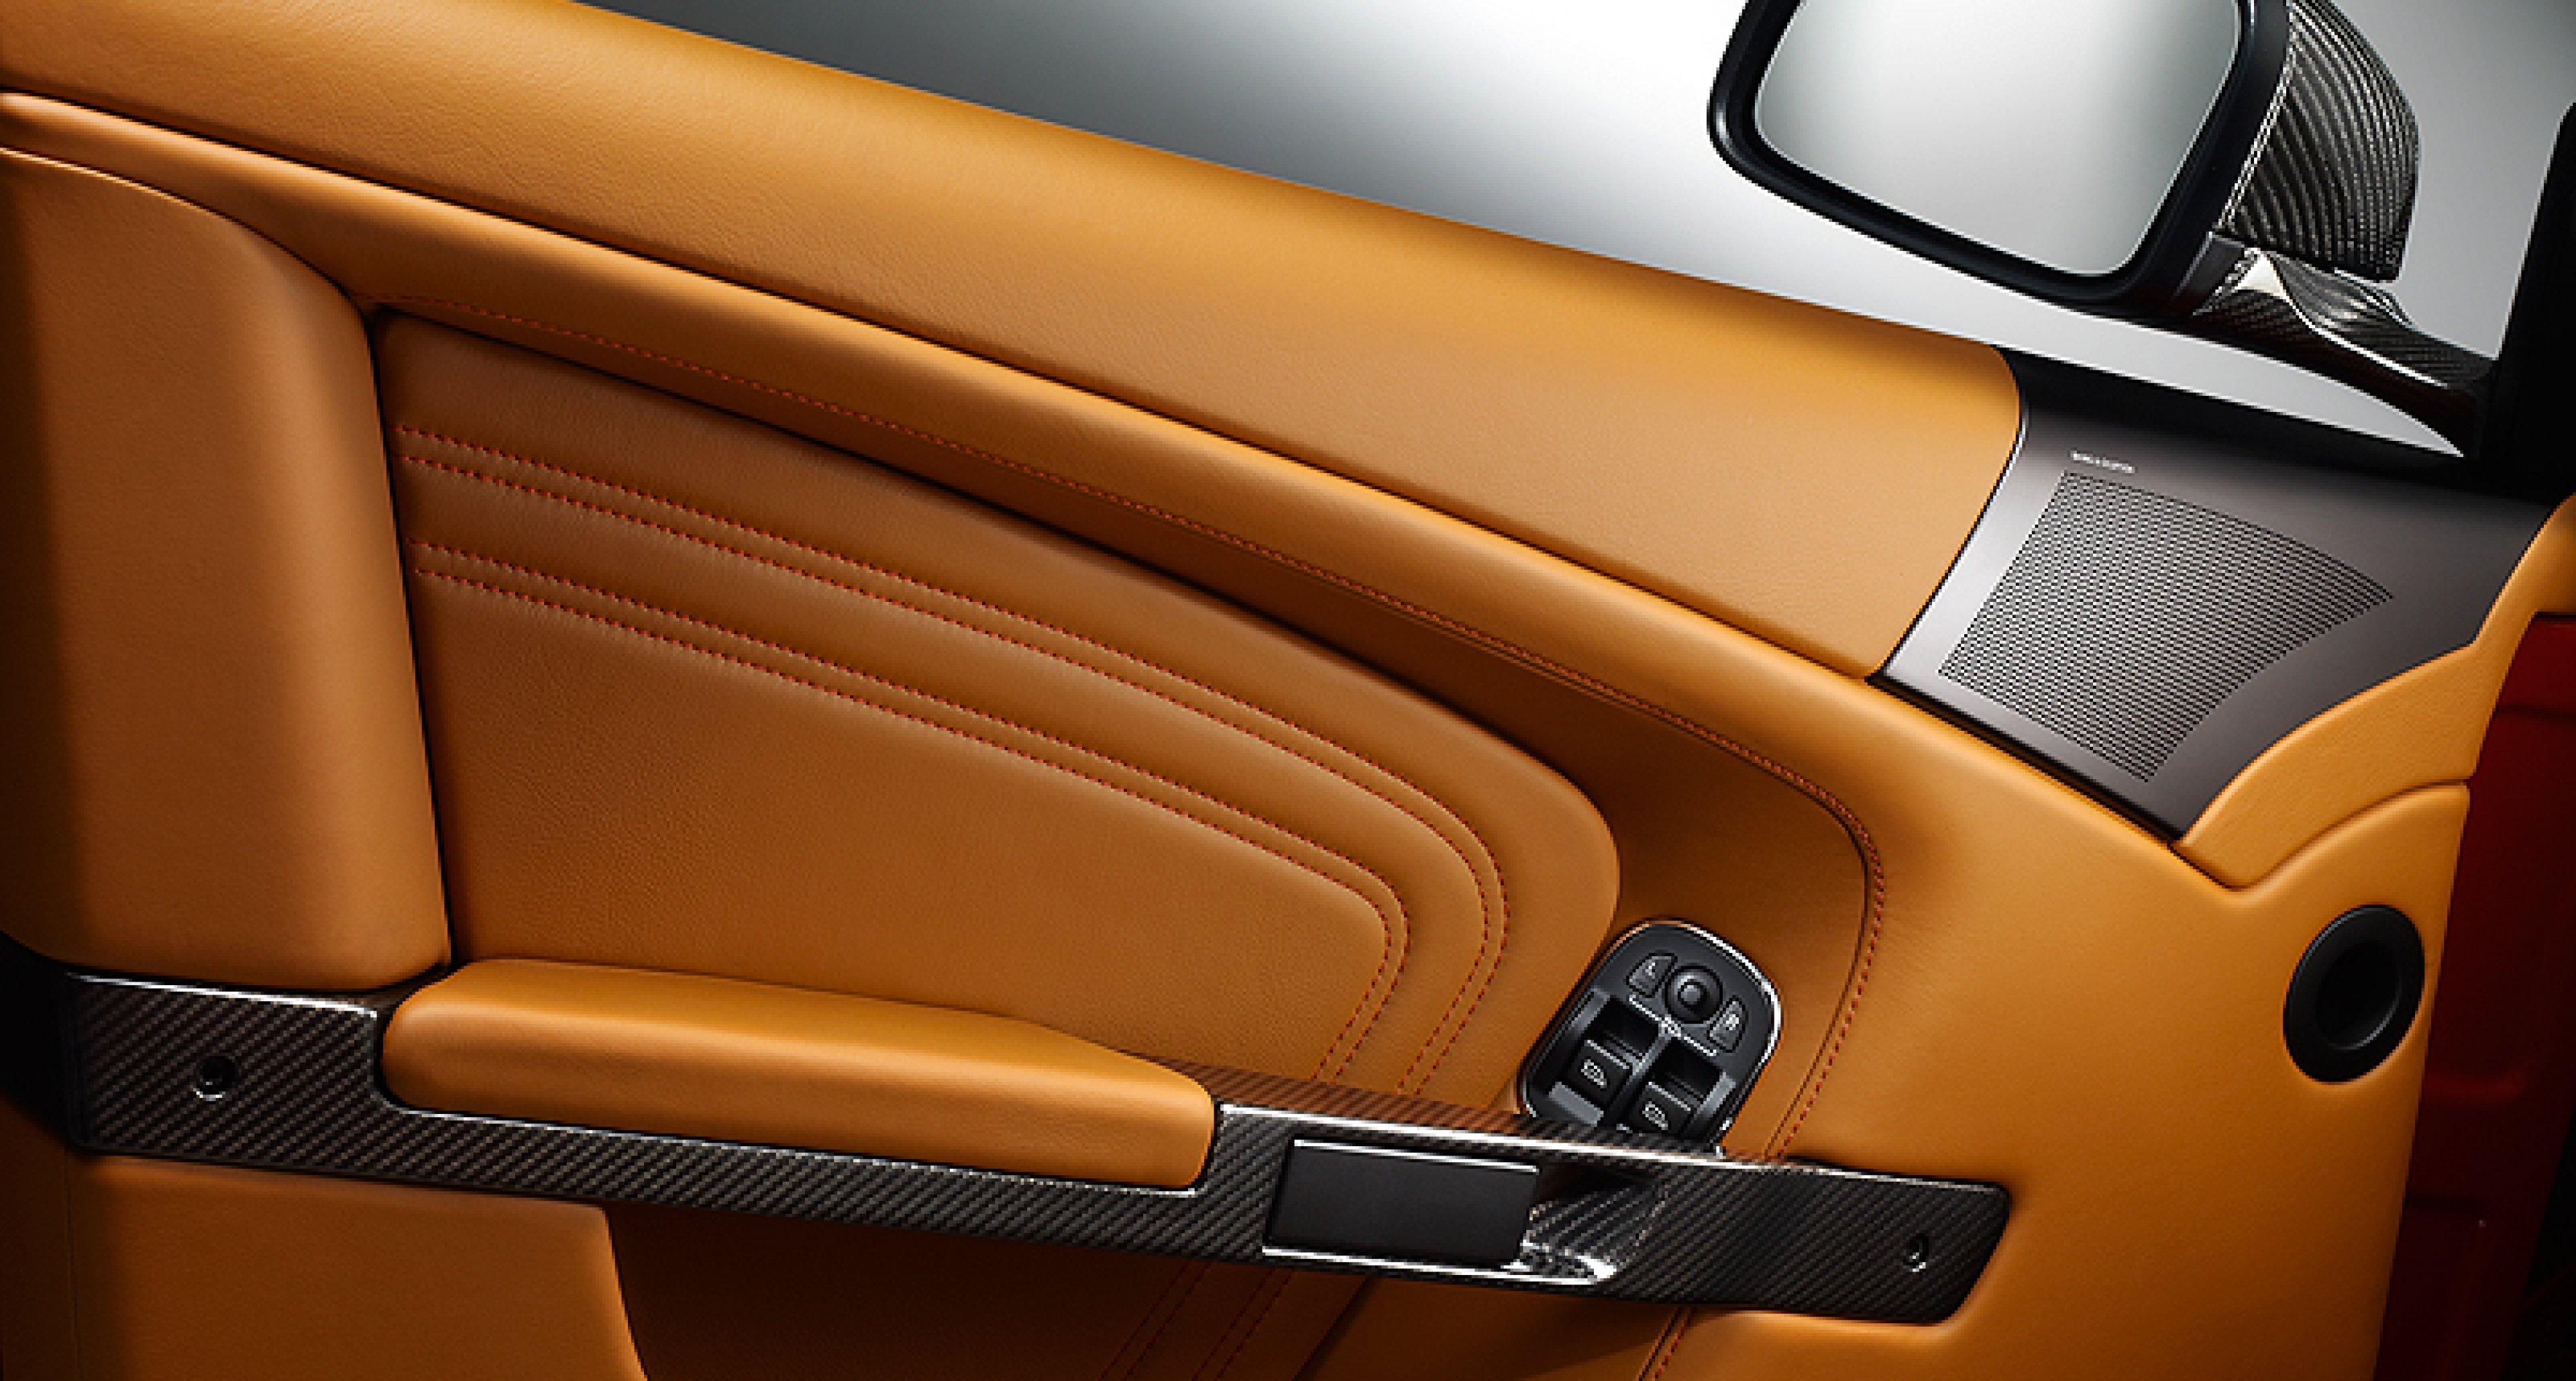 Aston Martin DBS Carbon Edition in Frankfurt